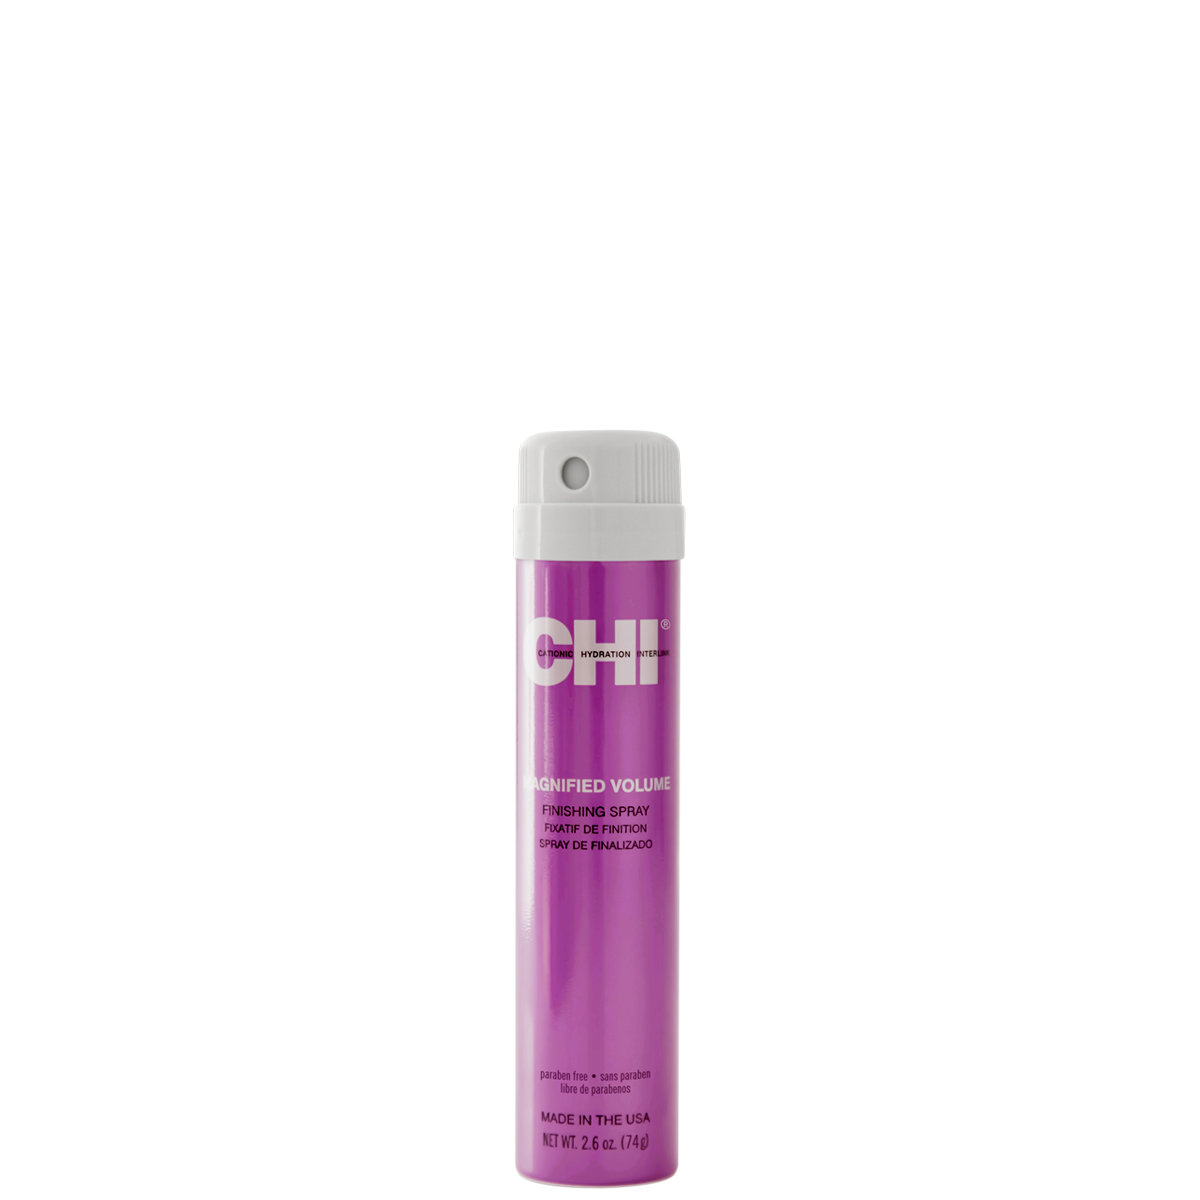 Magnified Volume Finishing Spray - 2.6oz